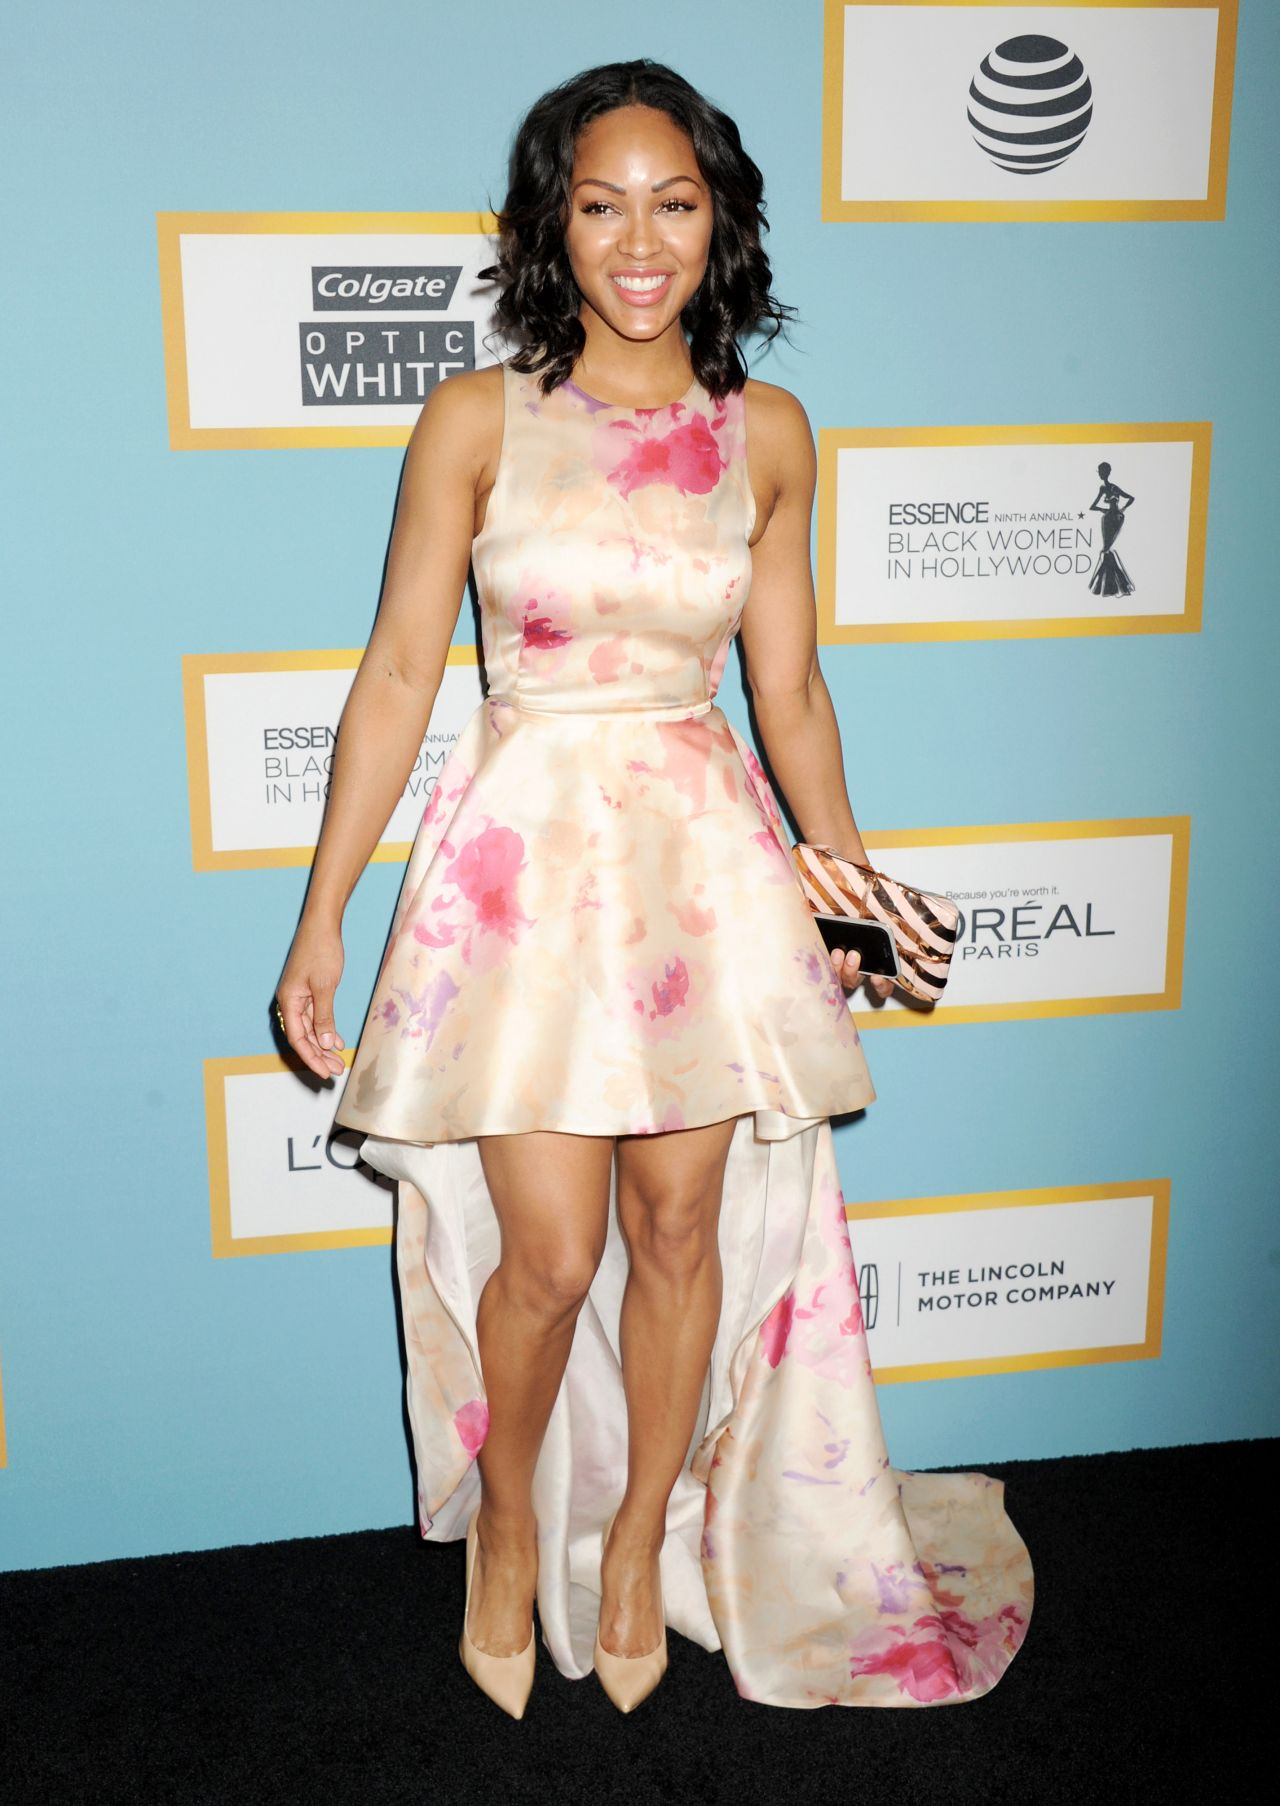 Essence Hollywood Issue Meagan Good Essence Black Women In Hollywood Awards